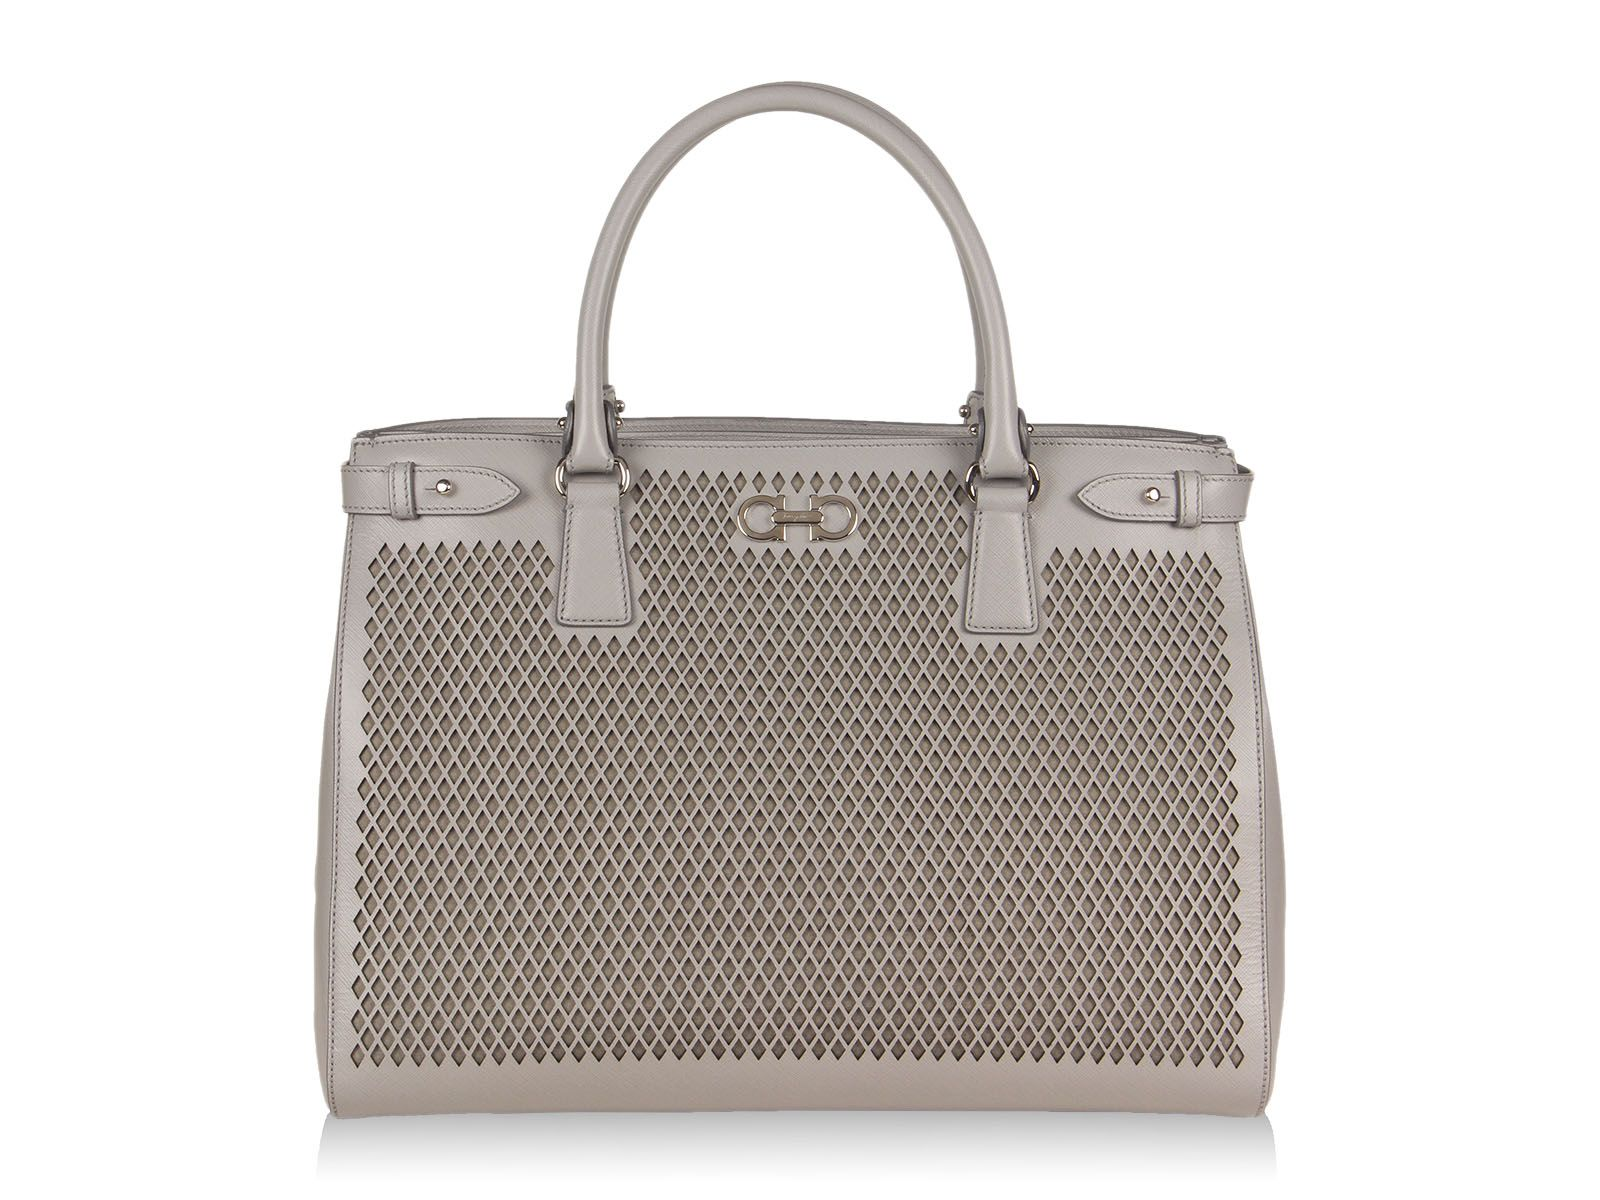 5d0c685bcc80 Bottega Veneta® Women s BUCKET BAG IN PACIFIC INTRECCIATO NAPPA ...